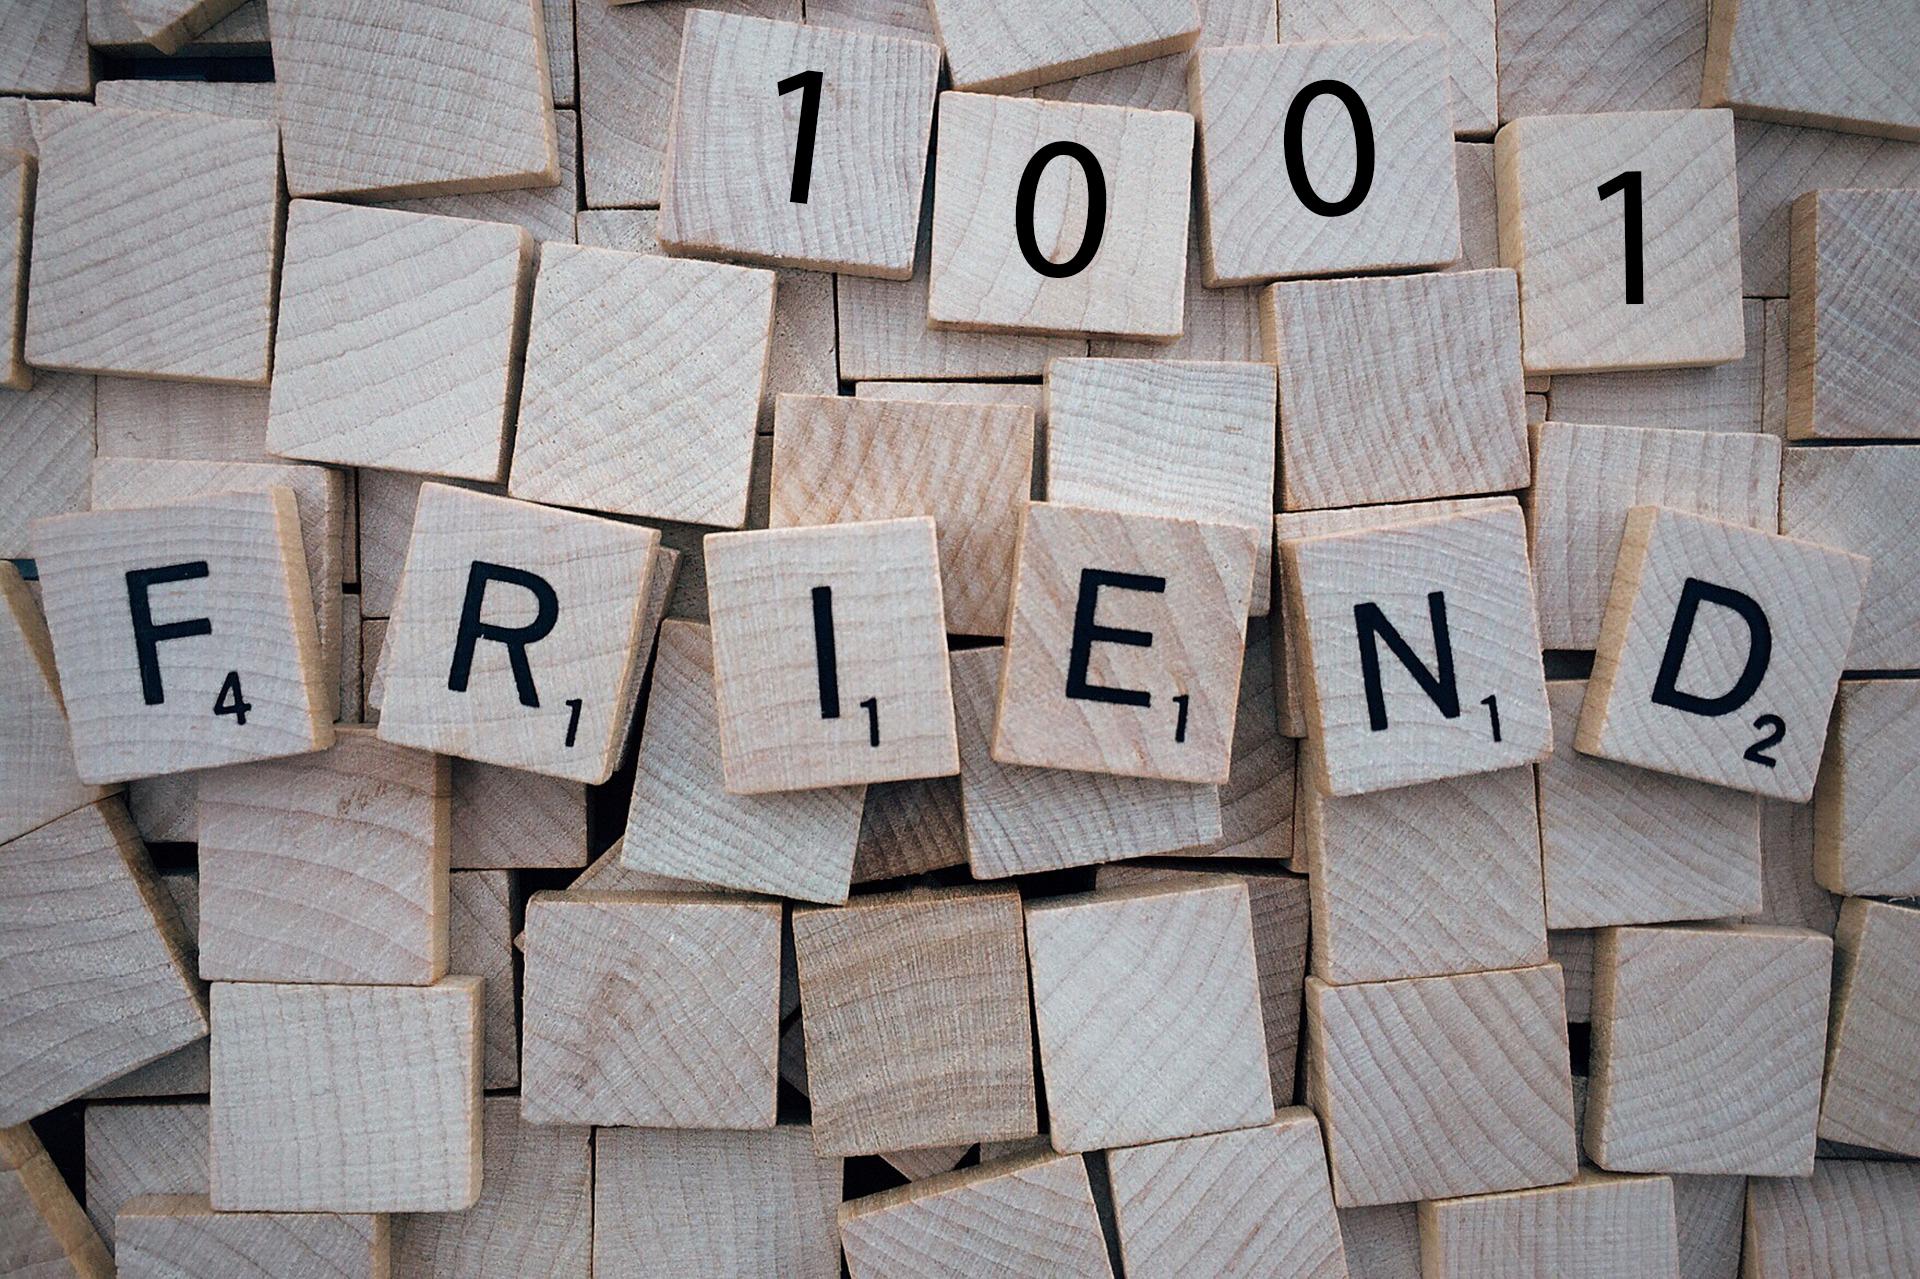 1001 Friends on Facebook